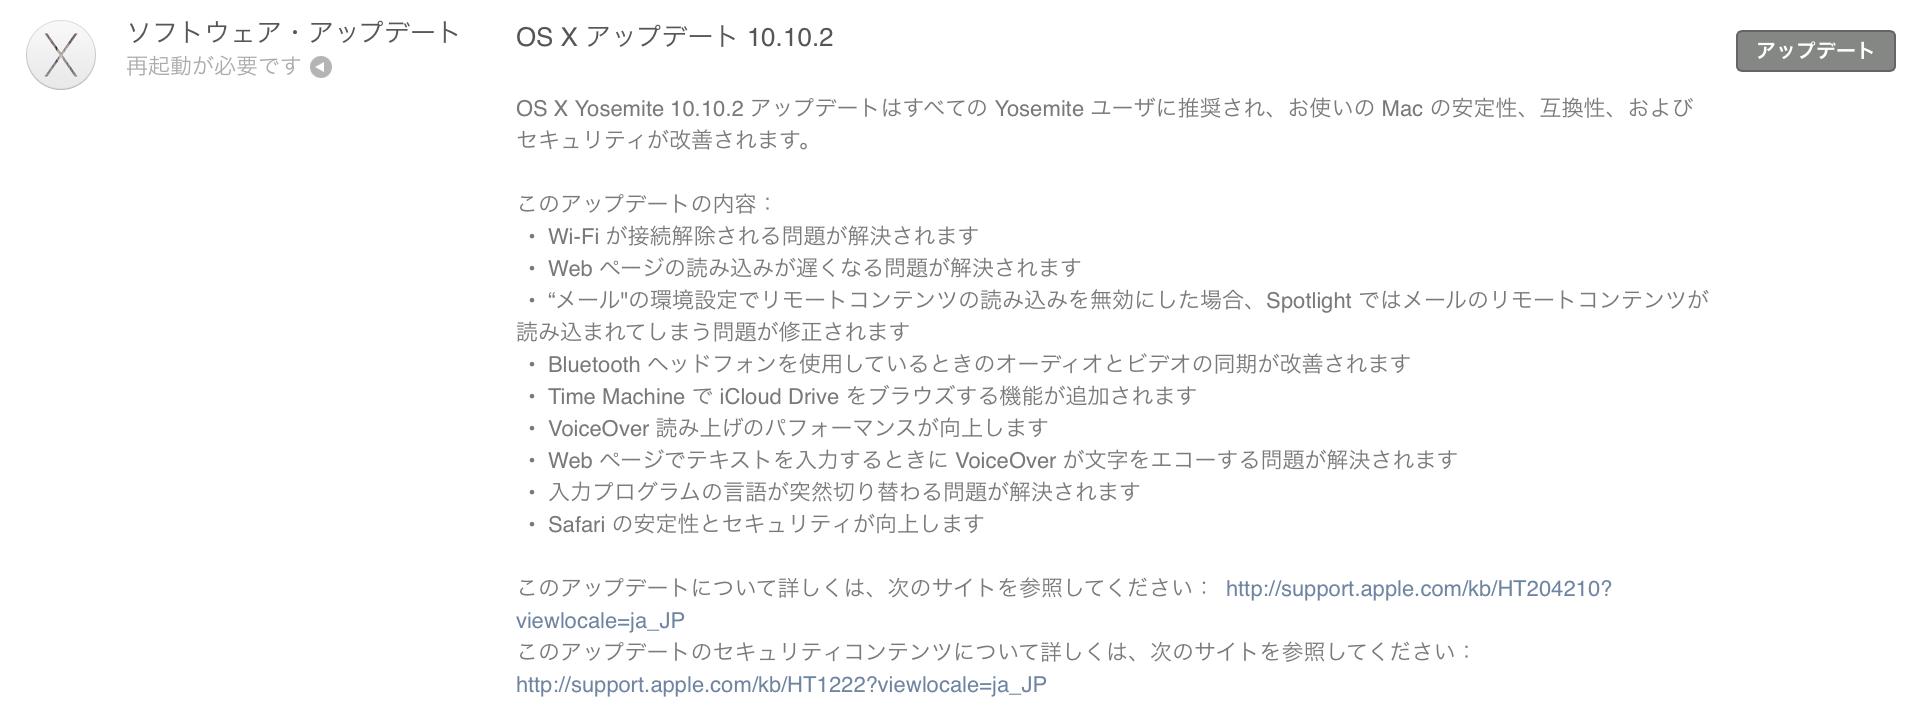 「OS X Yosemite 10.10.2」が正式リリース!Wi-Fi、VoiceOverなどの不具合改善とパフォーマンス向上